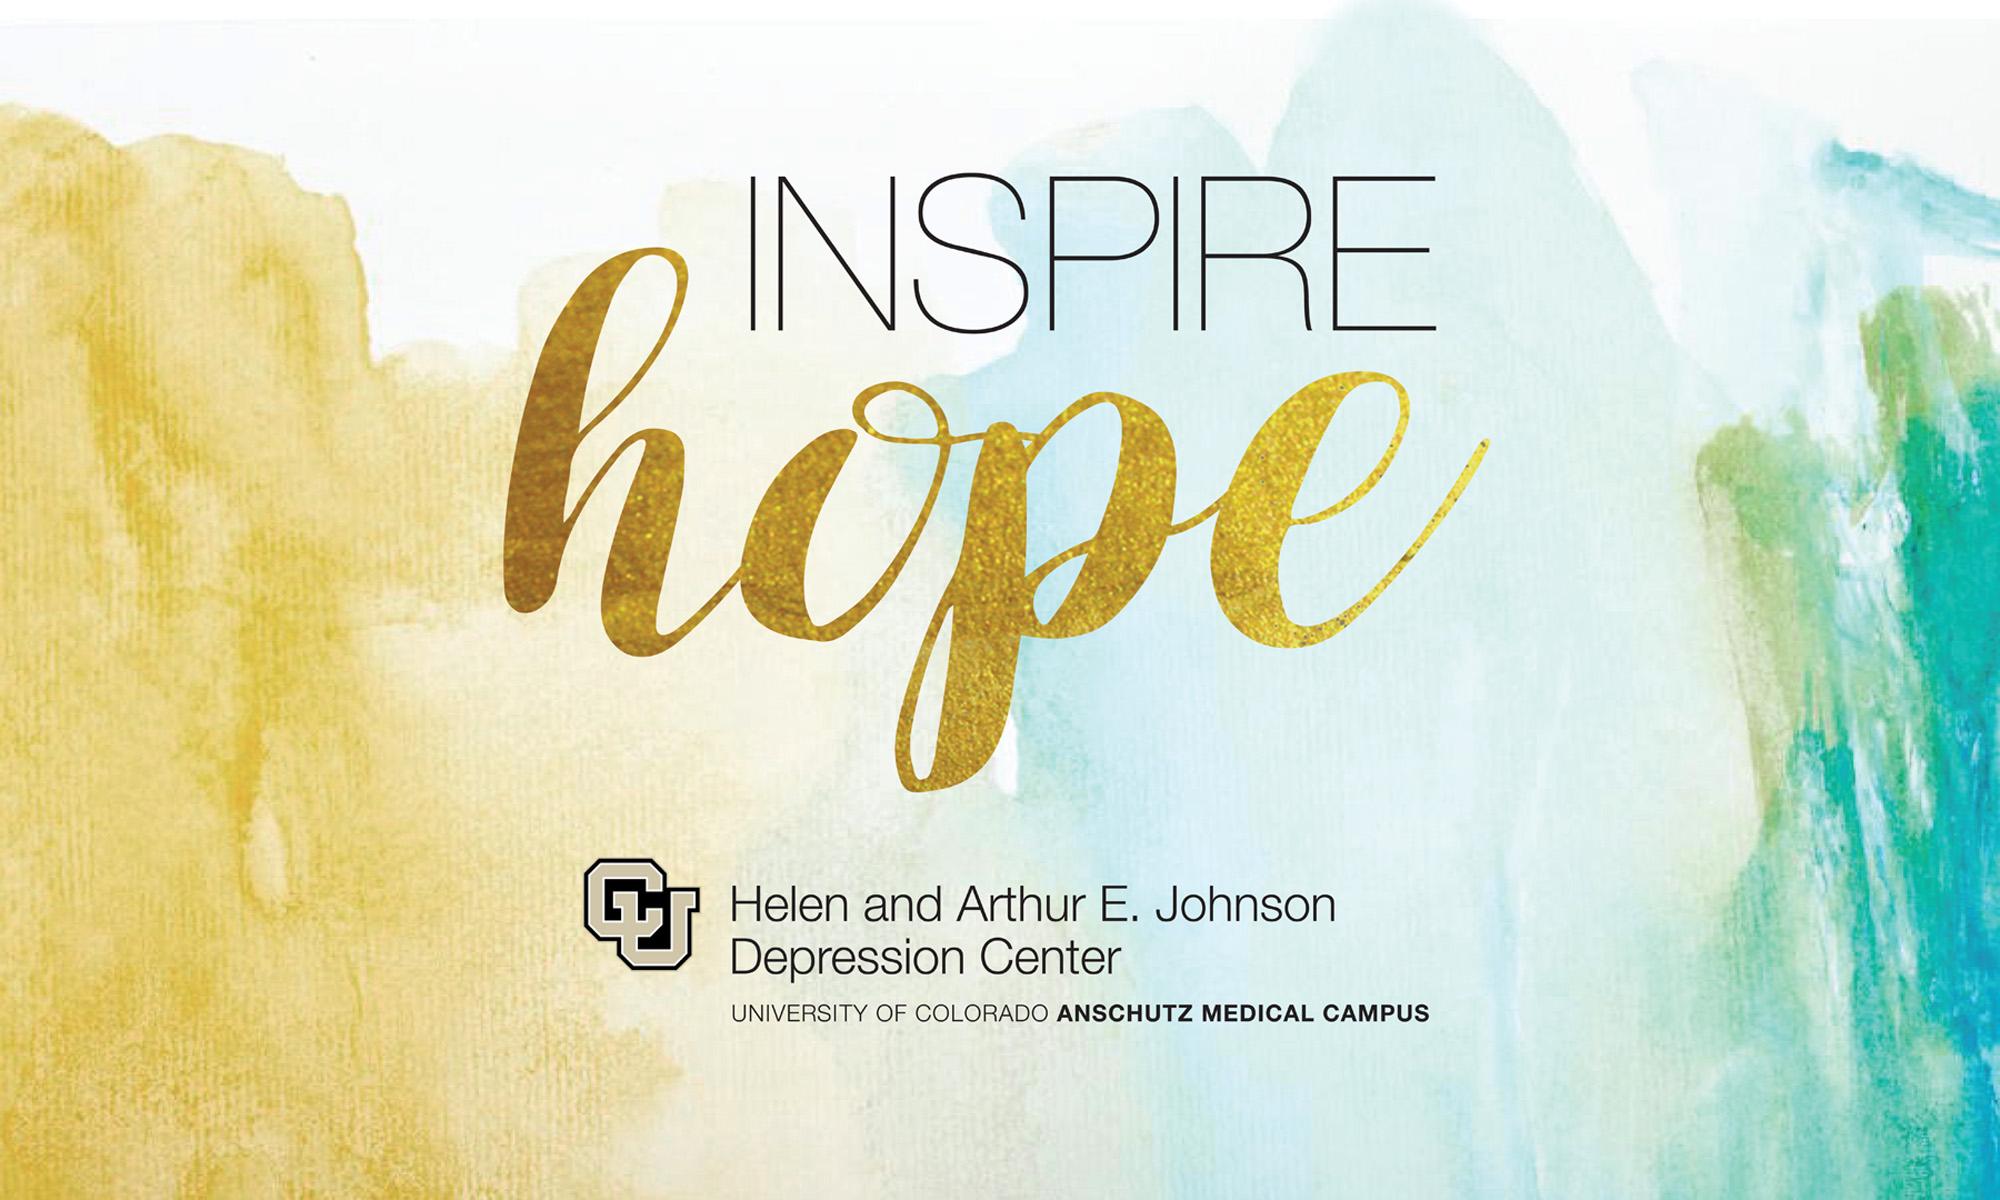 Helen and Arthur E. Johnson Depression Center's Annual Luncheon